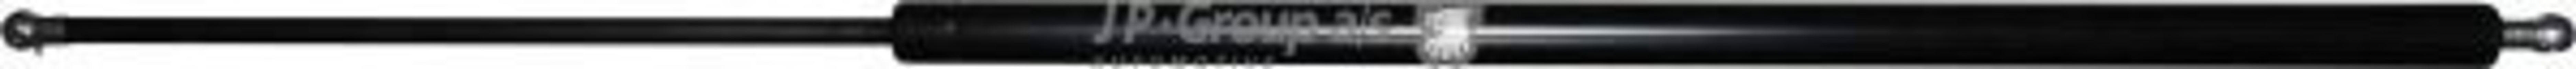 Амортизатор крышки багажника JP GROUP 1281204000